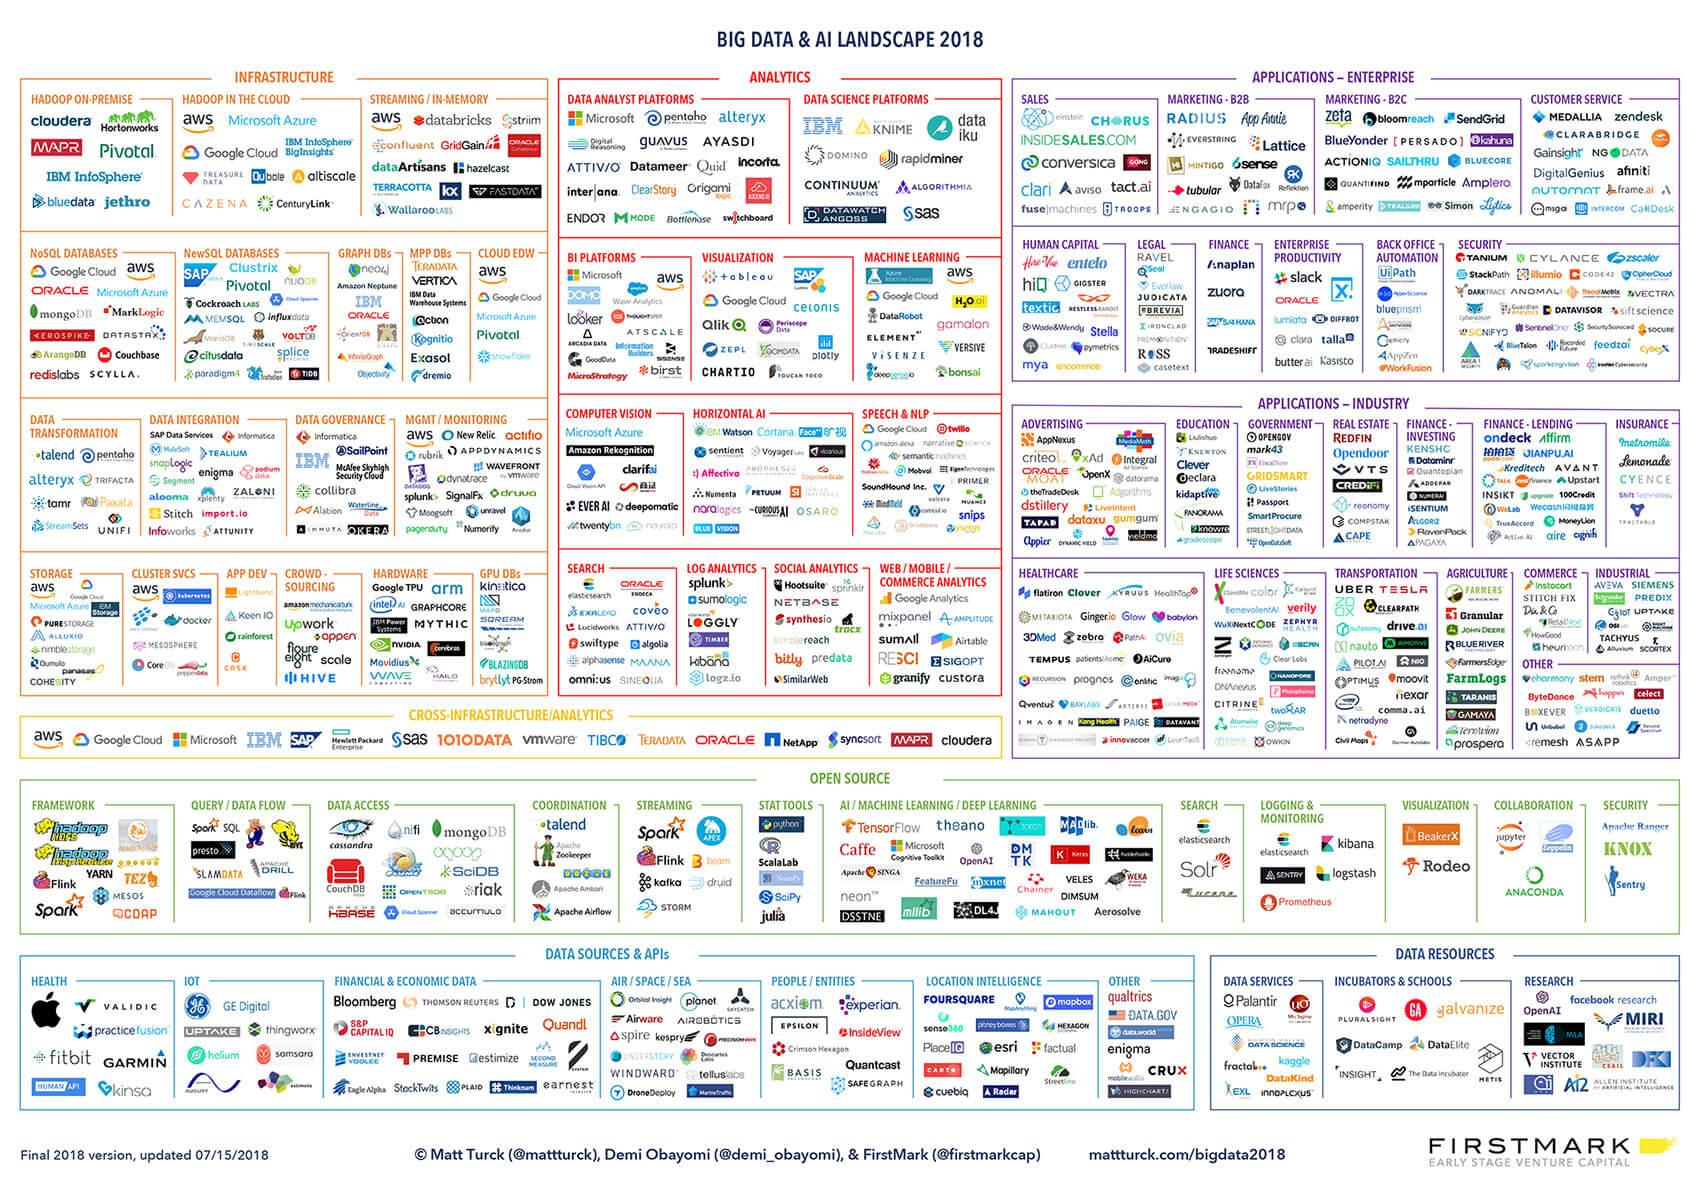 Big Data and AI Landscape 2018